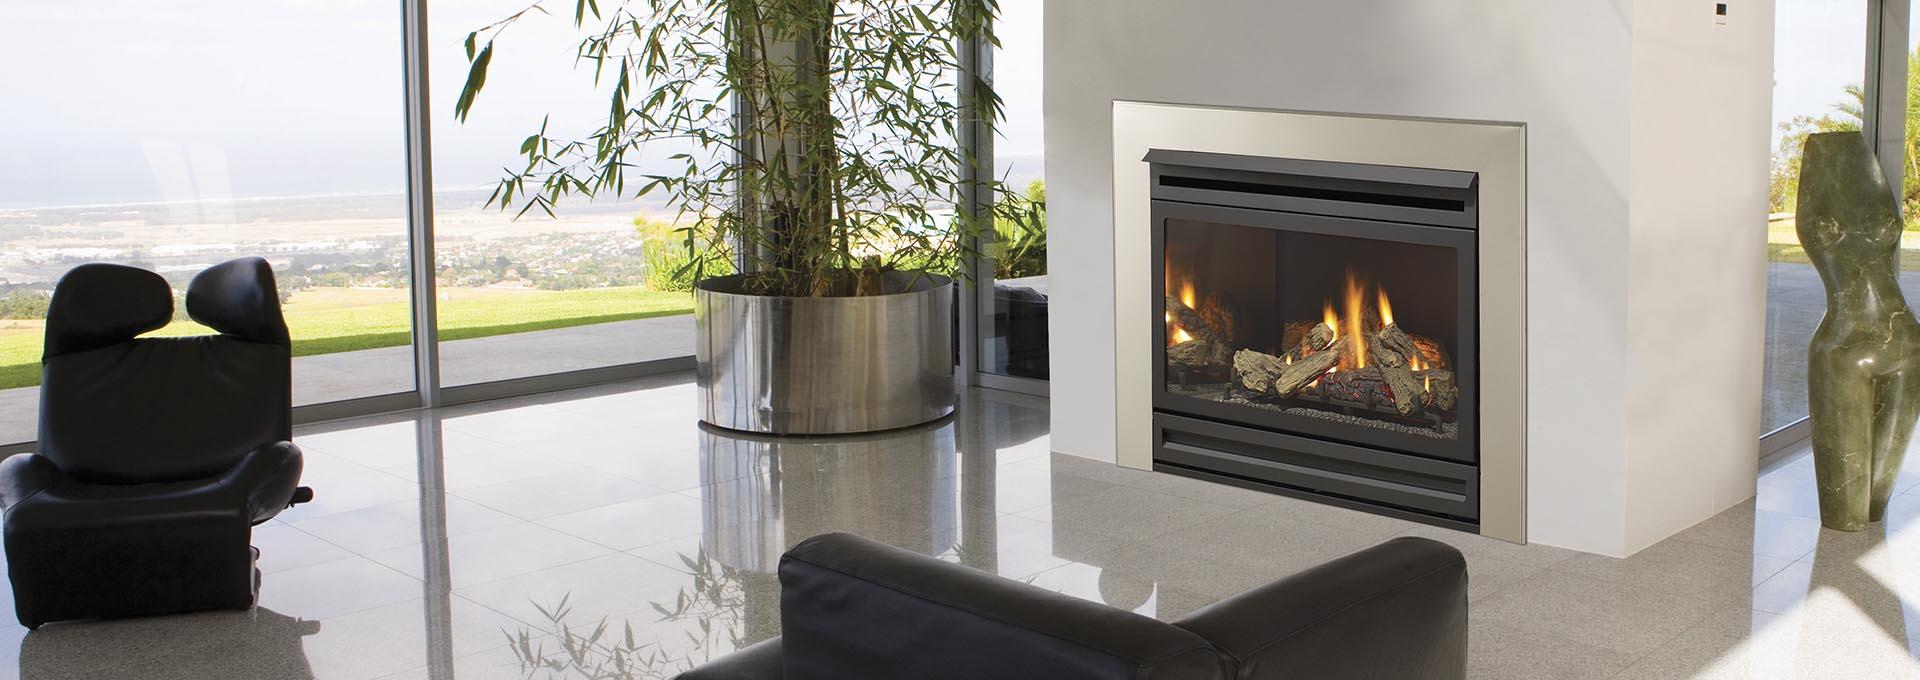 pg36 gas log fireplace gas fireplaces regency fireplace